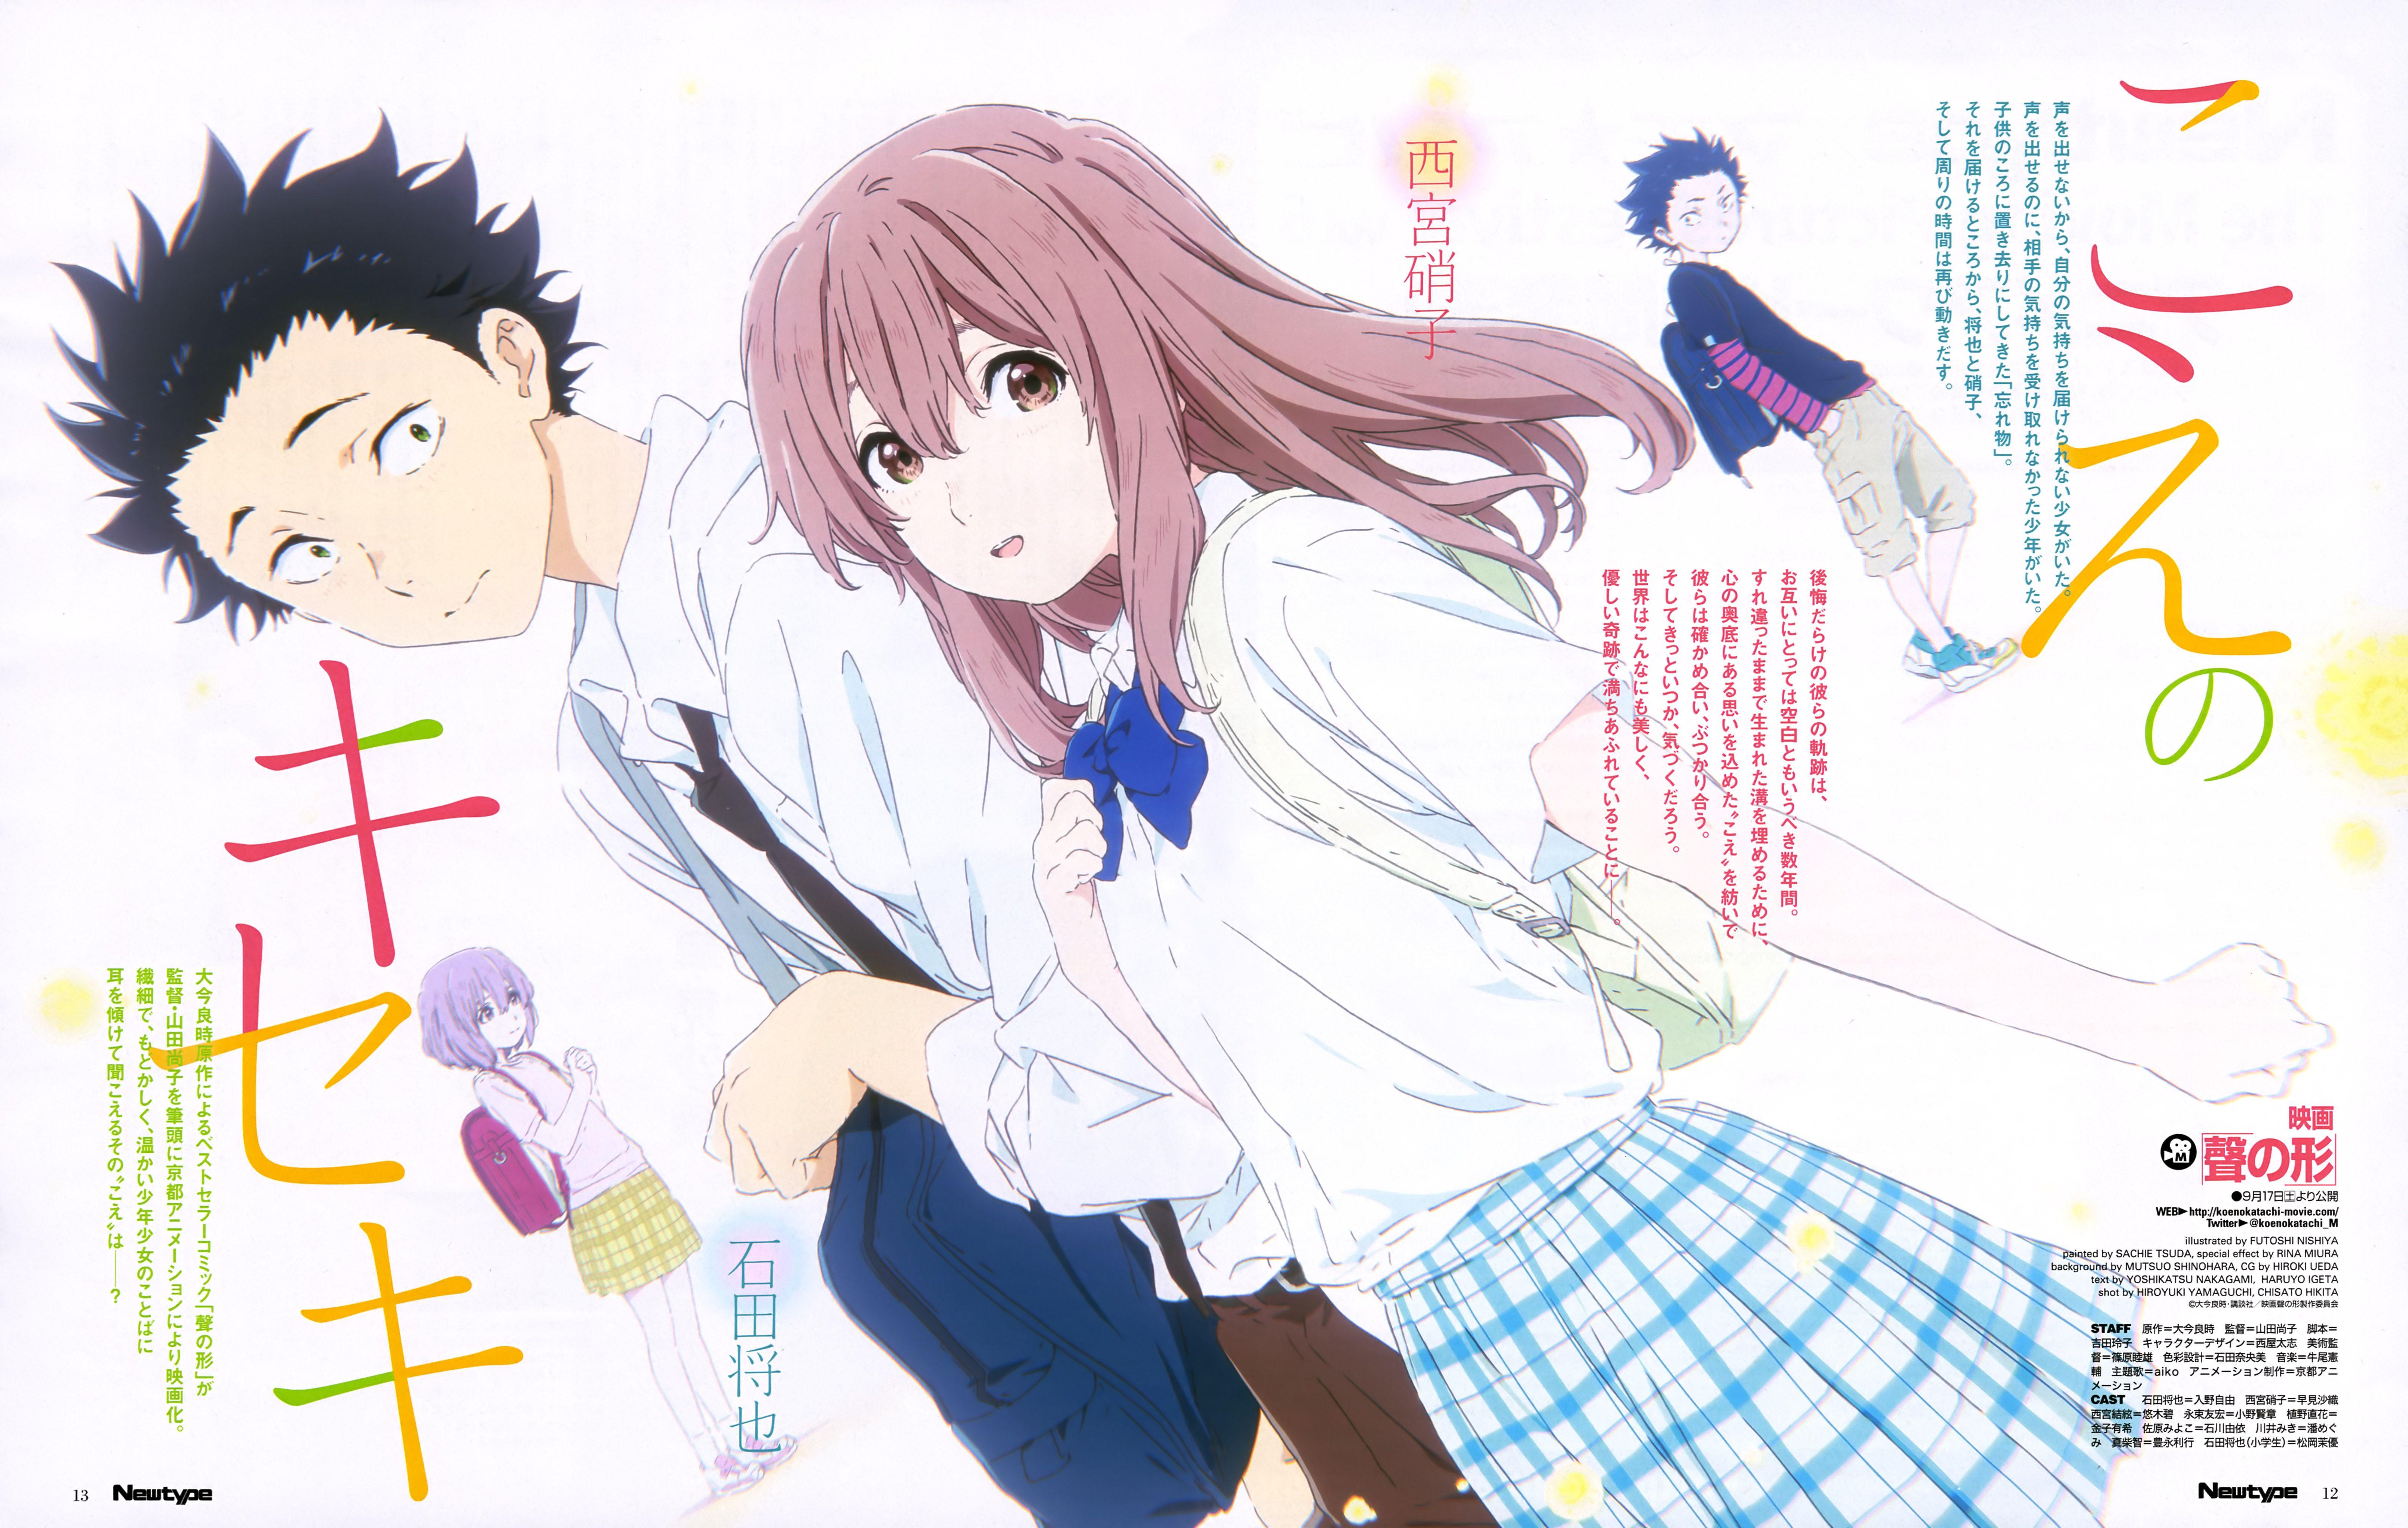 Tags Scan, Official Art, Kyoto Animation, Nishiya Futoshi